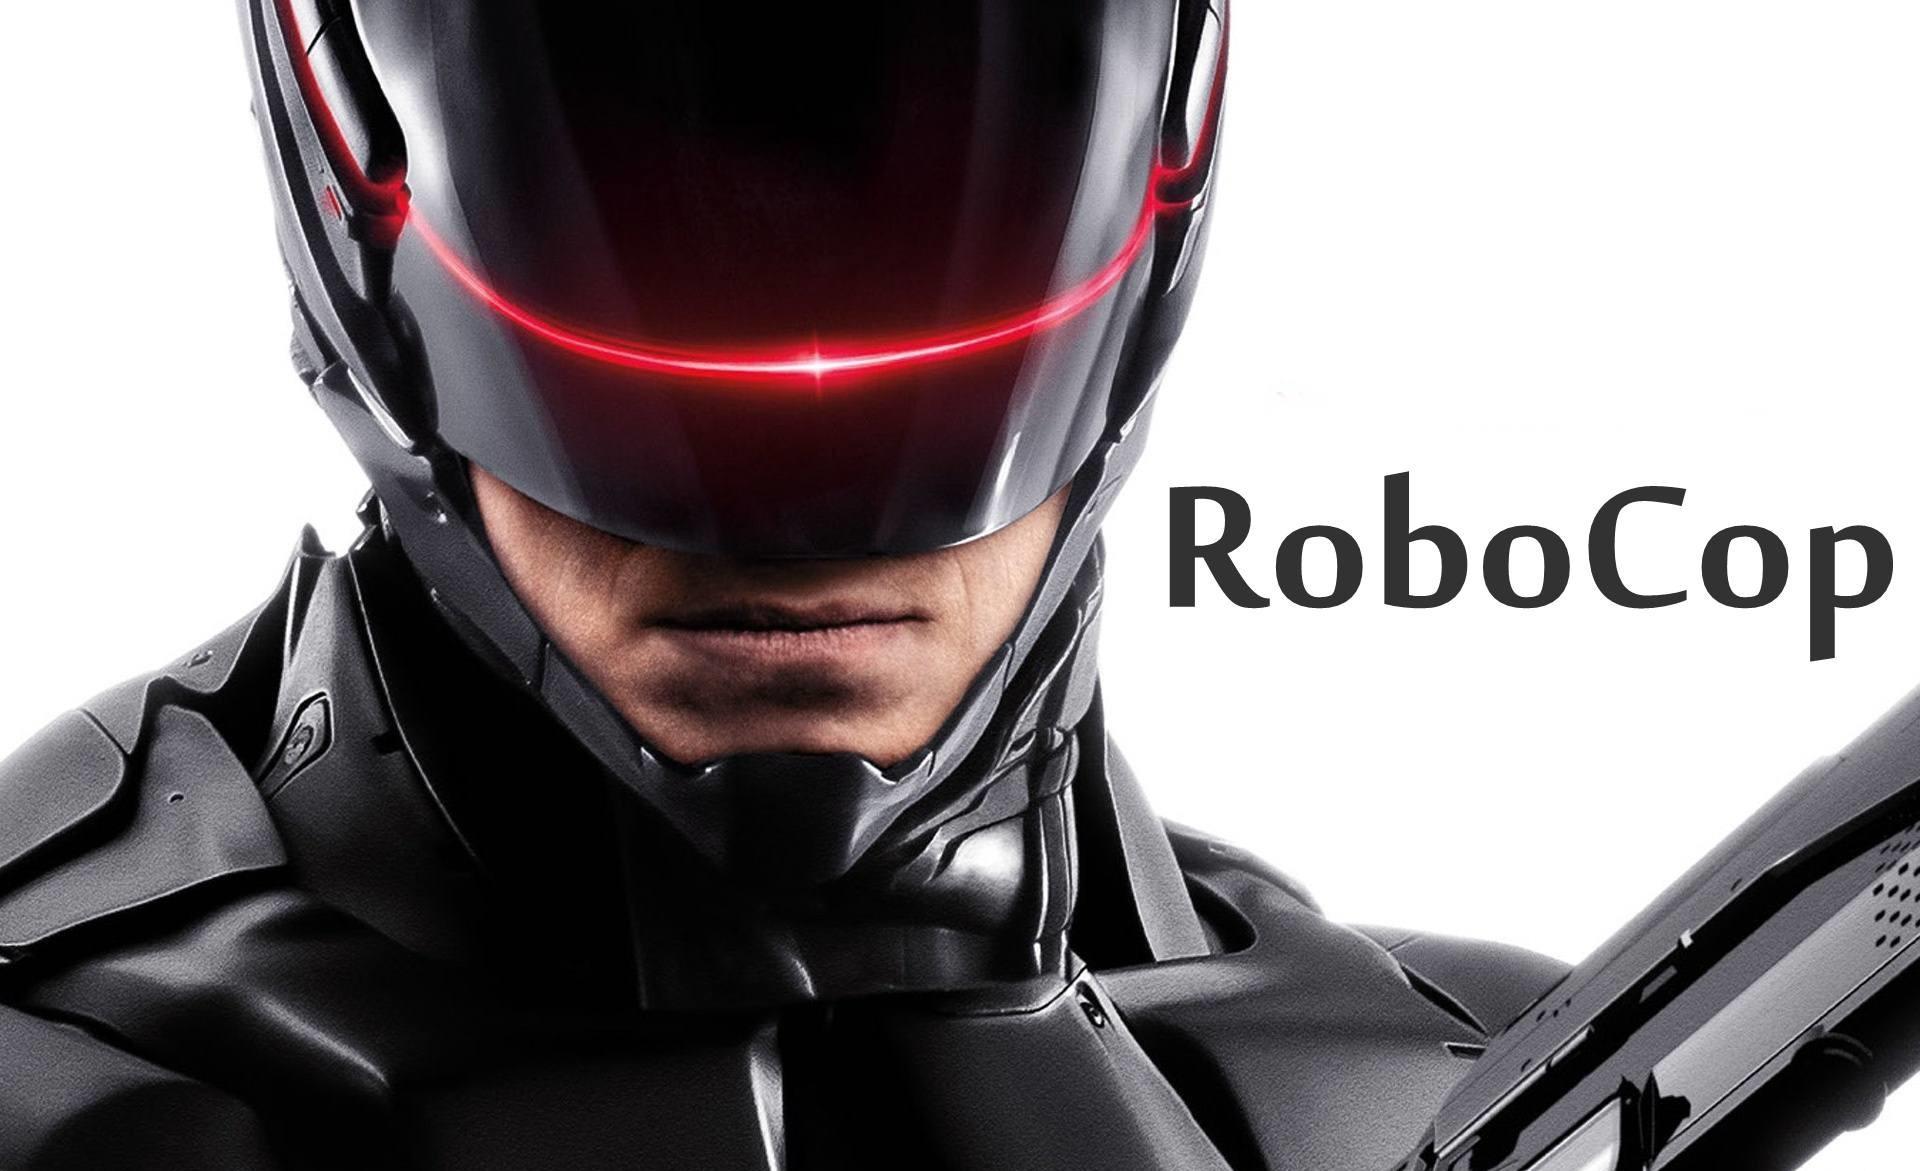 robocop 2014 full movie free download